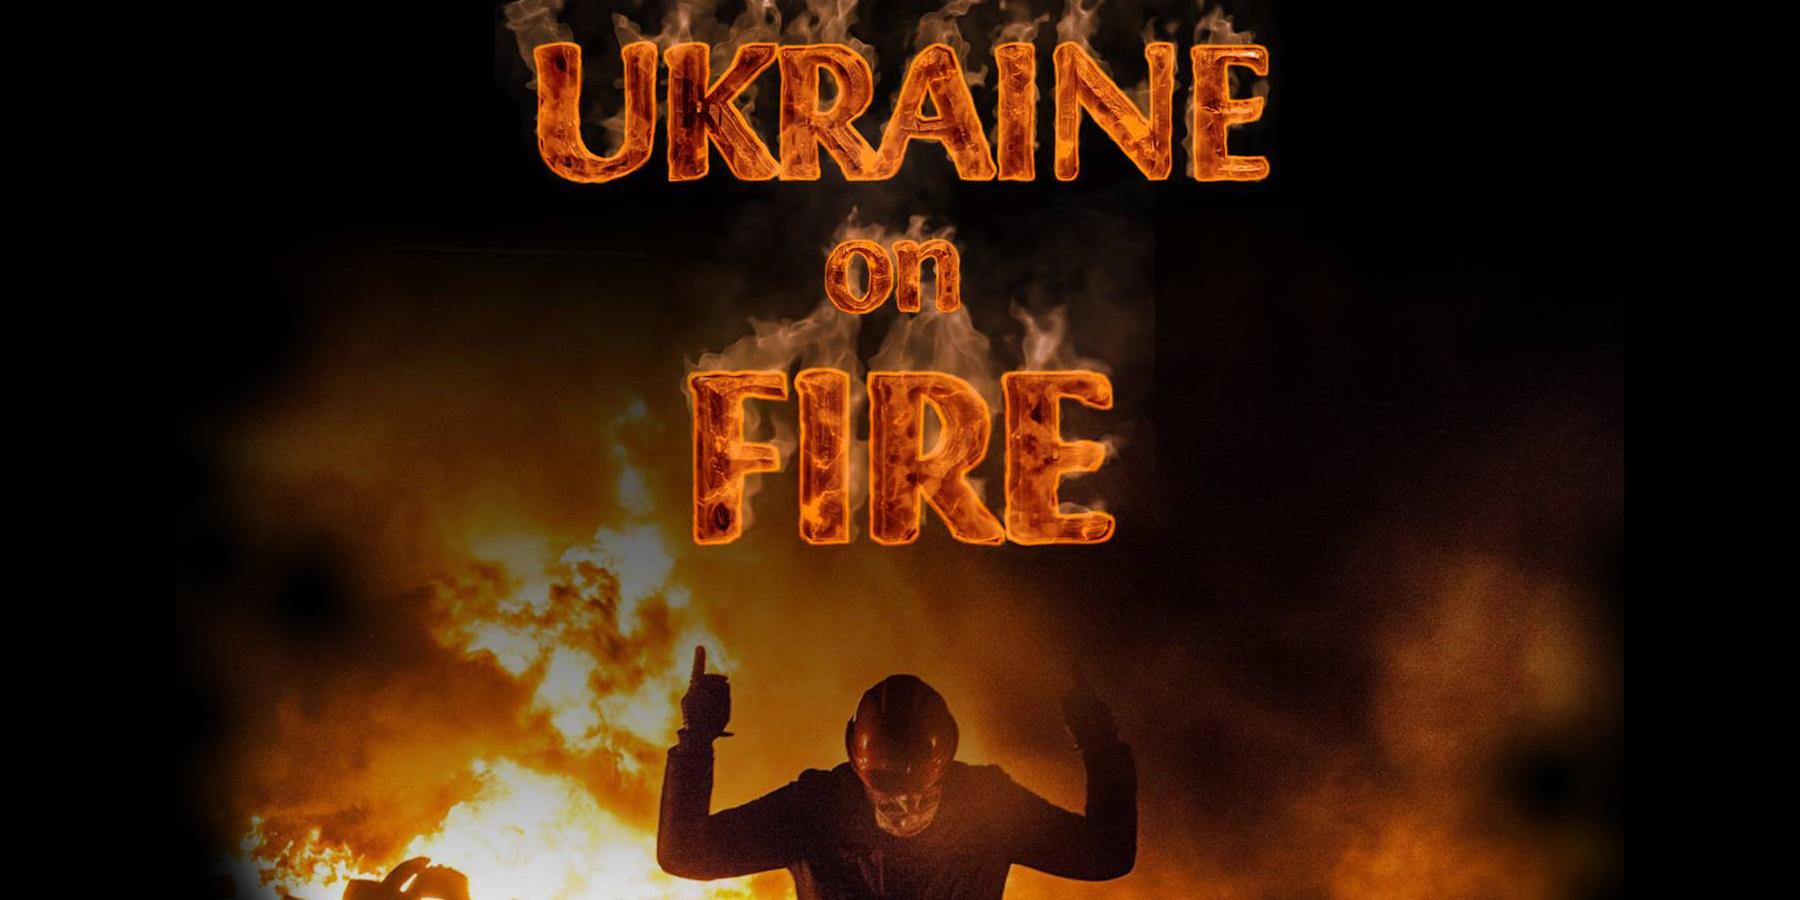 ukraine-on-fire sito